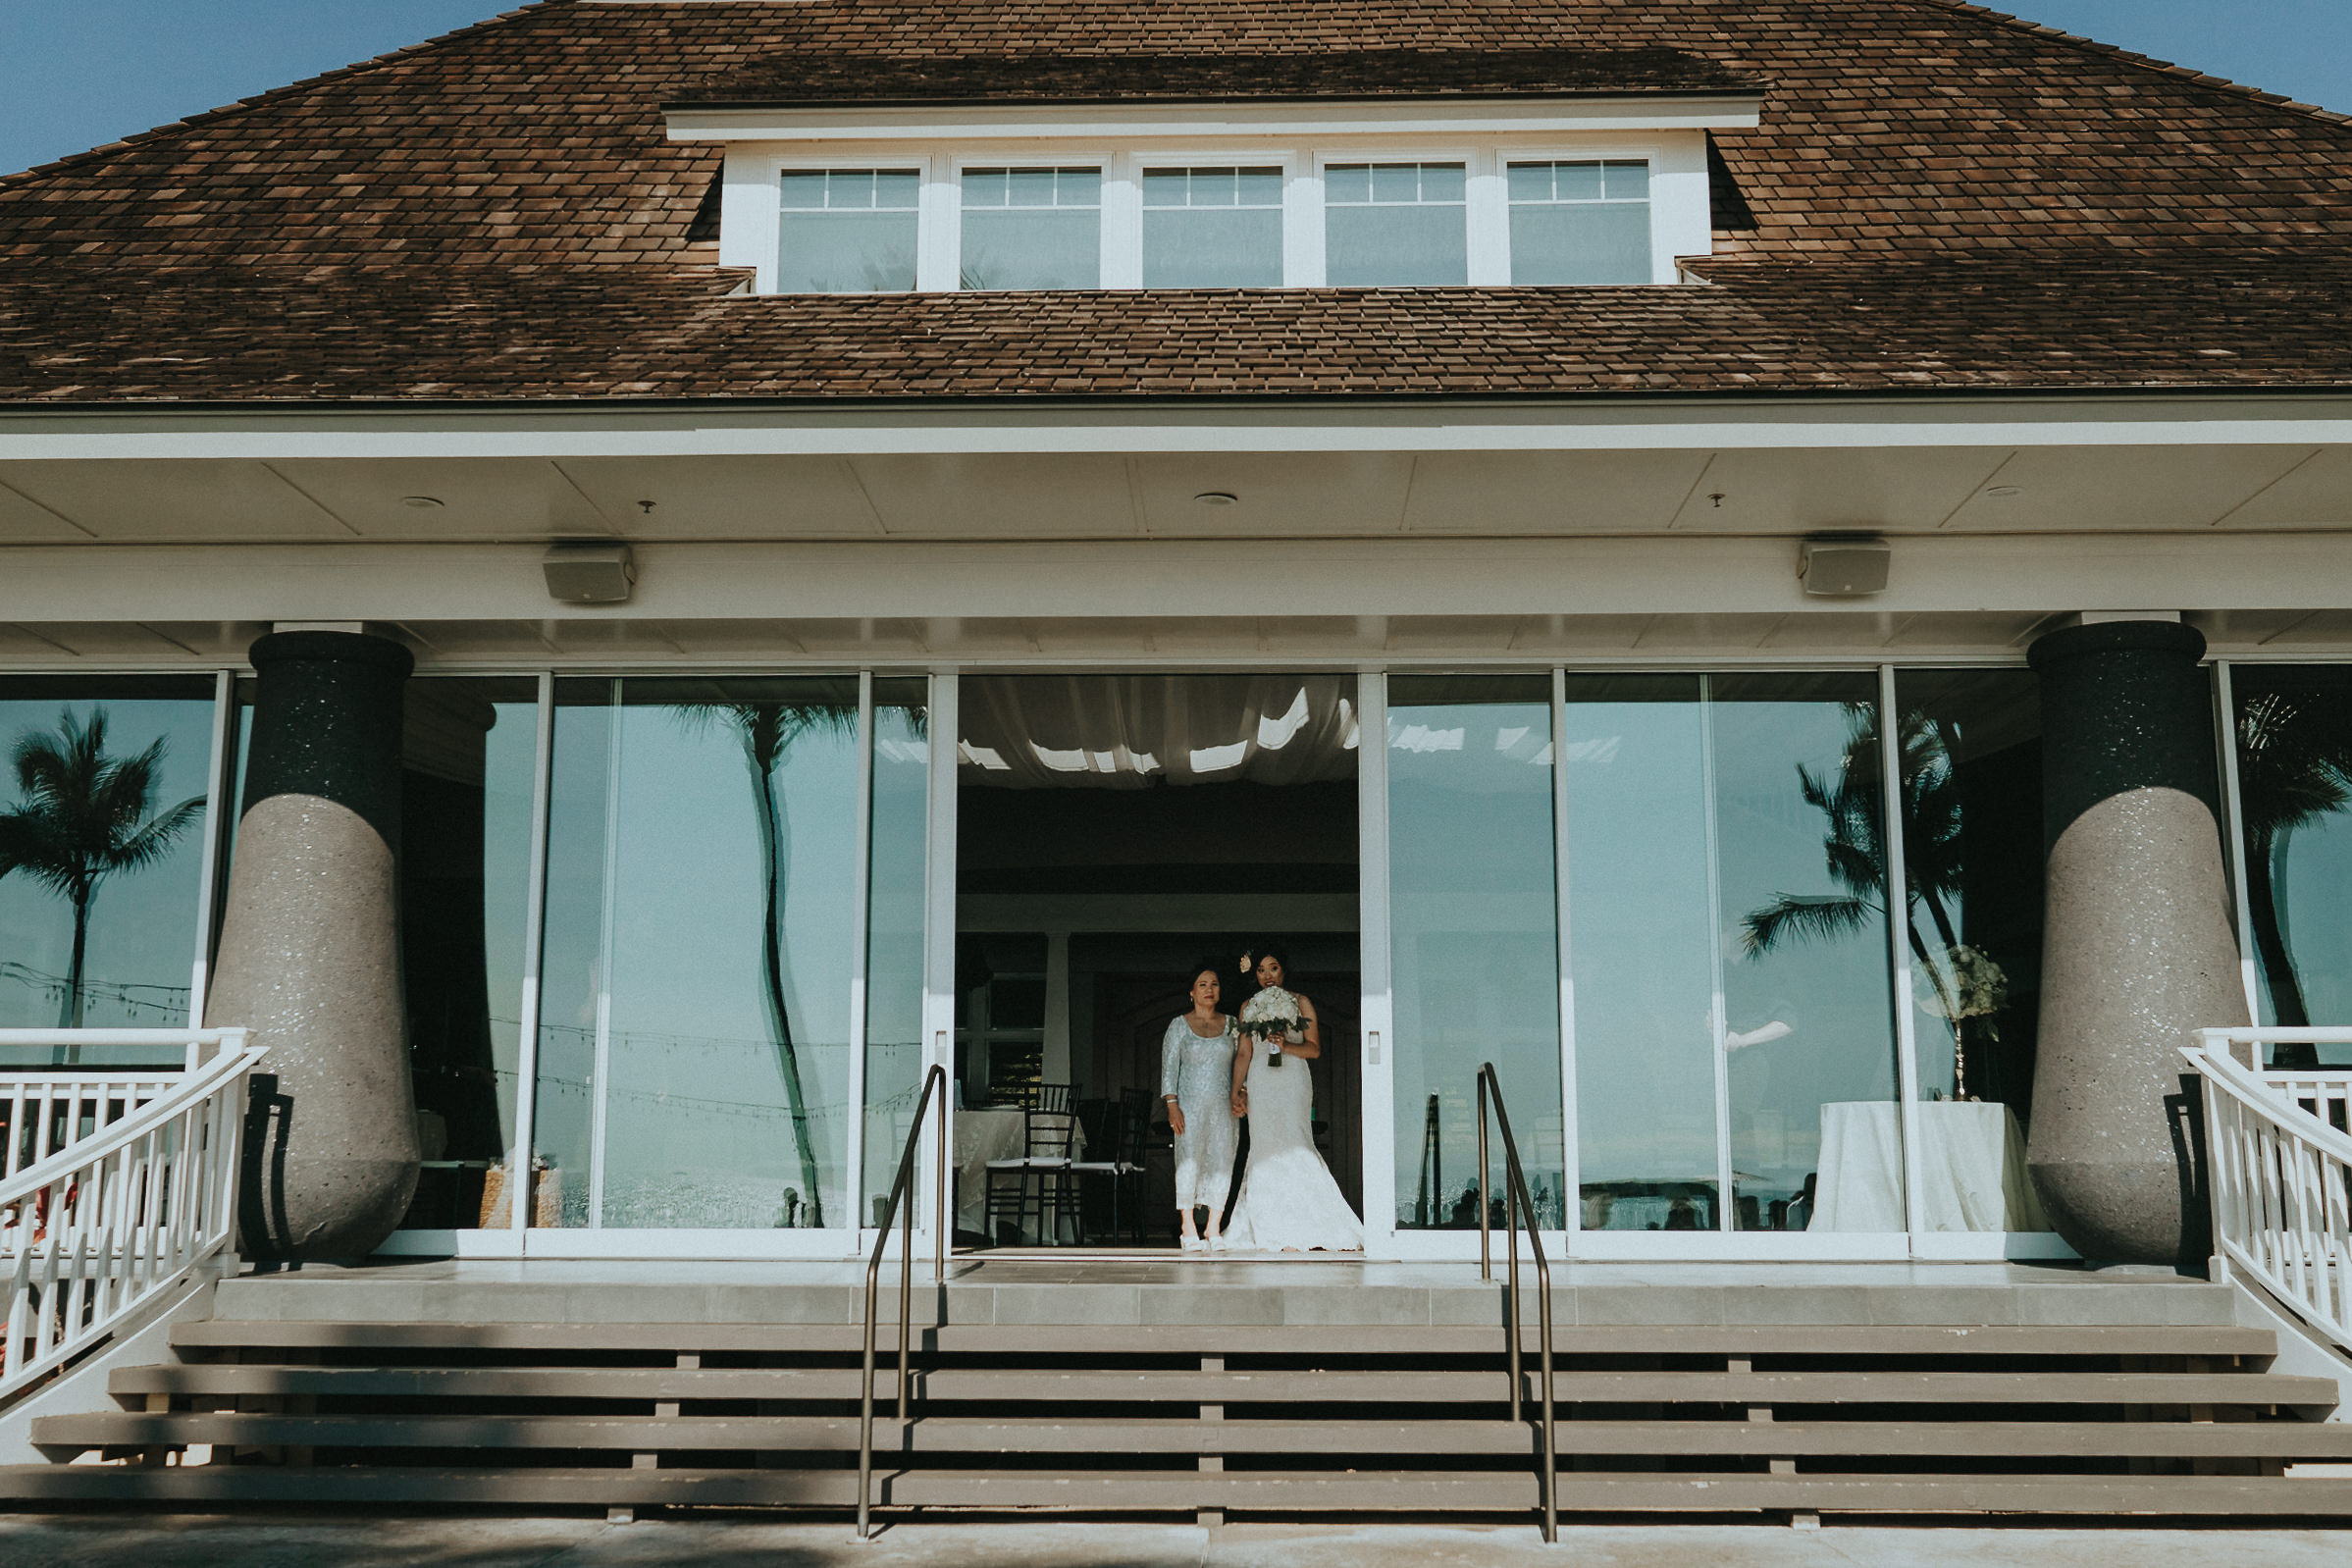 Maui_Destination_wedding_Alfred_Tang-07742.jpg